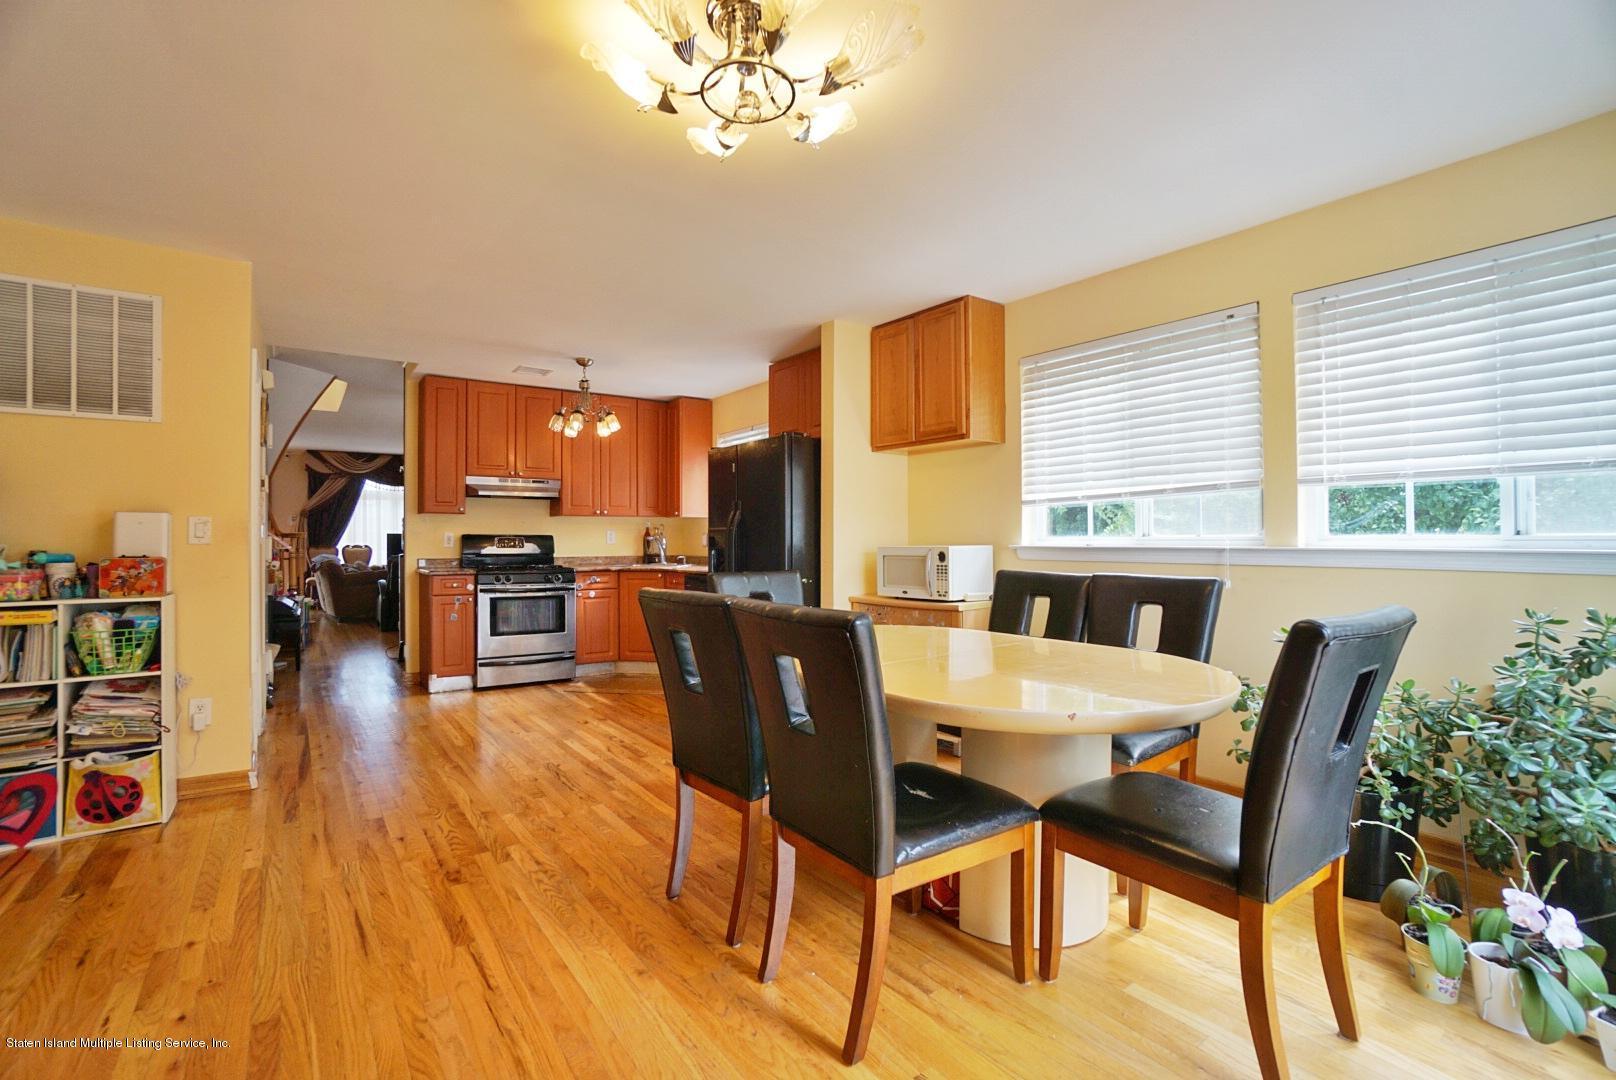 Single Family - Semi-Attached 36 Zwicky Avenue  Staten Island, NY 10306, MLS-1131911-7